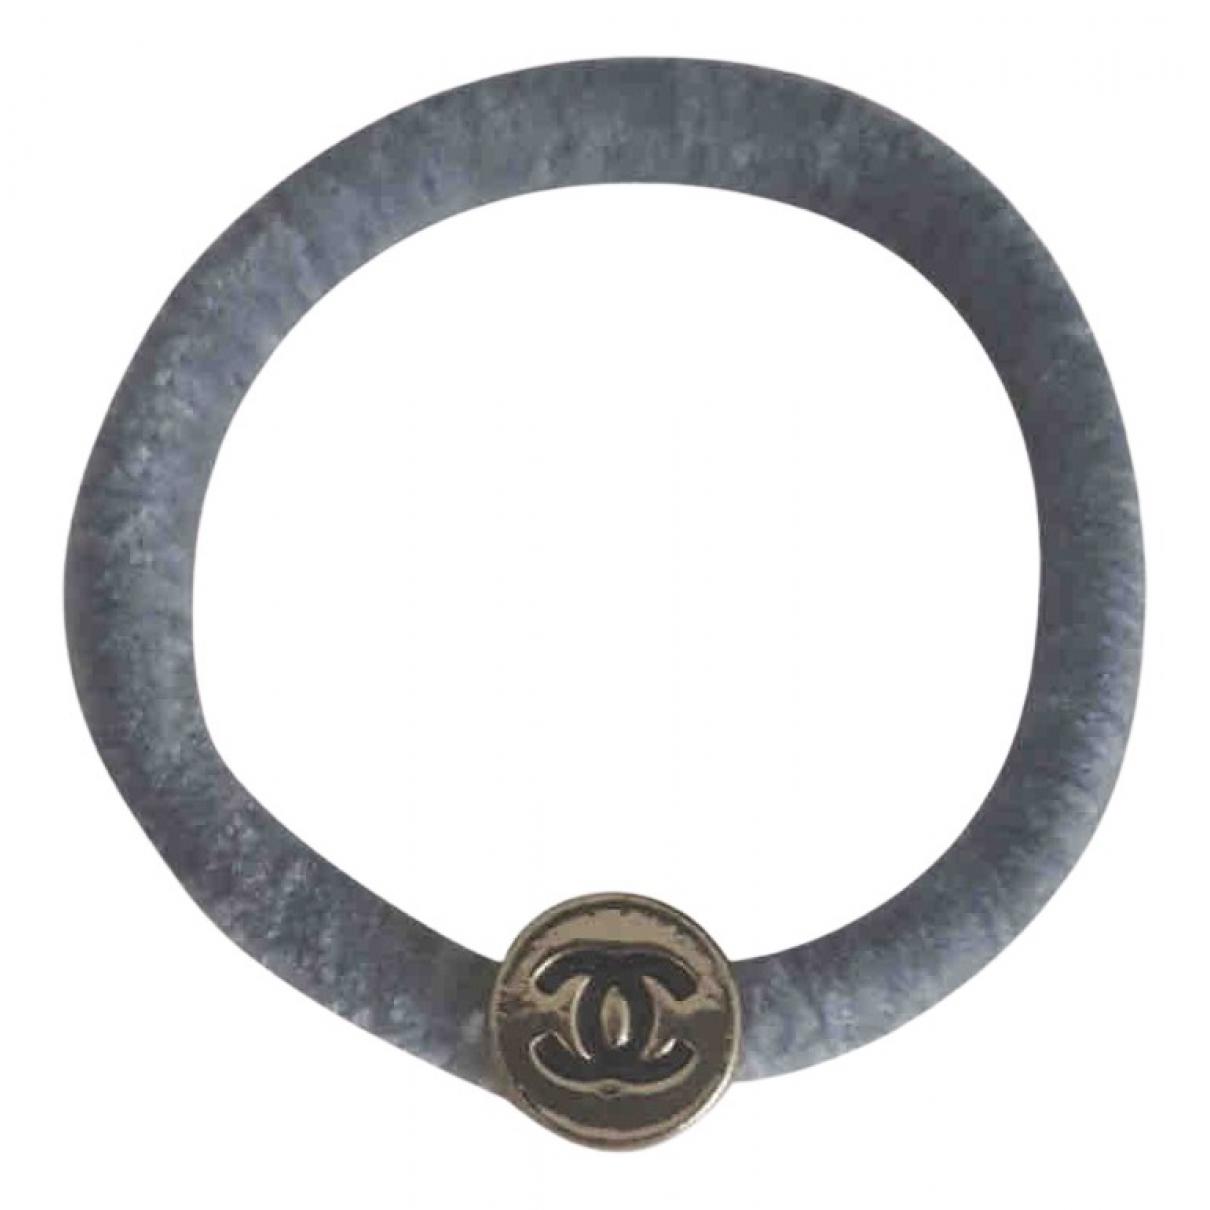 Chanel CC Haarschmuck in  Grau Metall